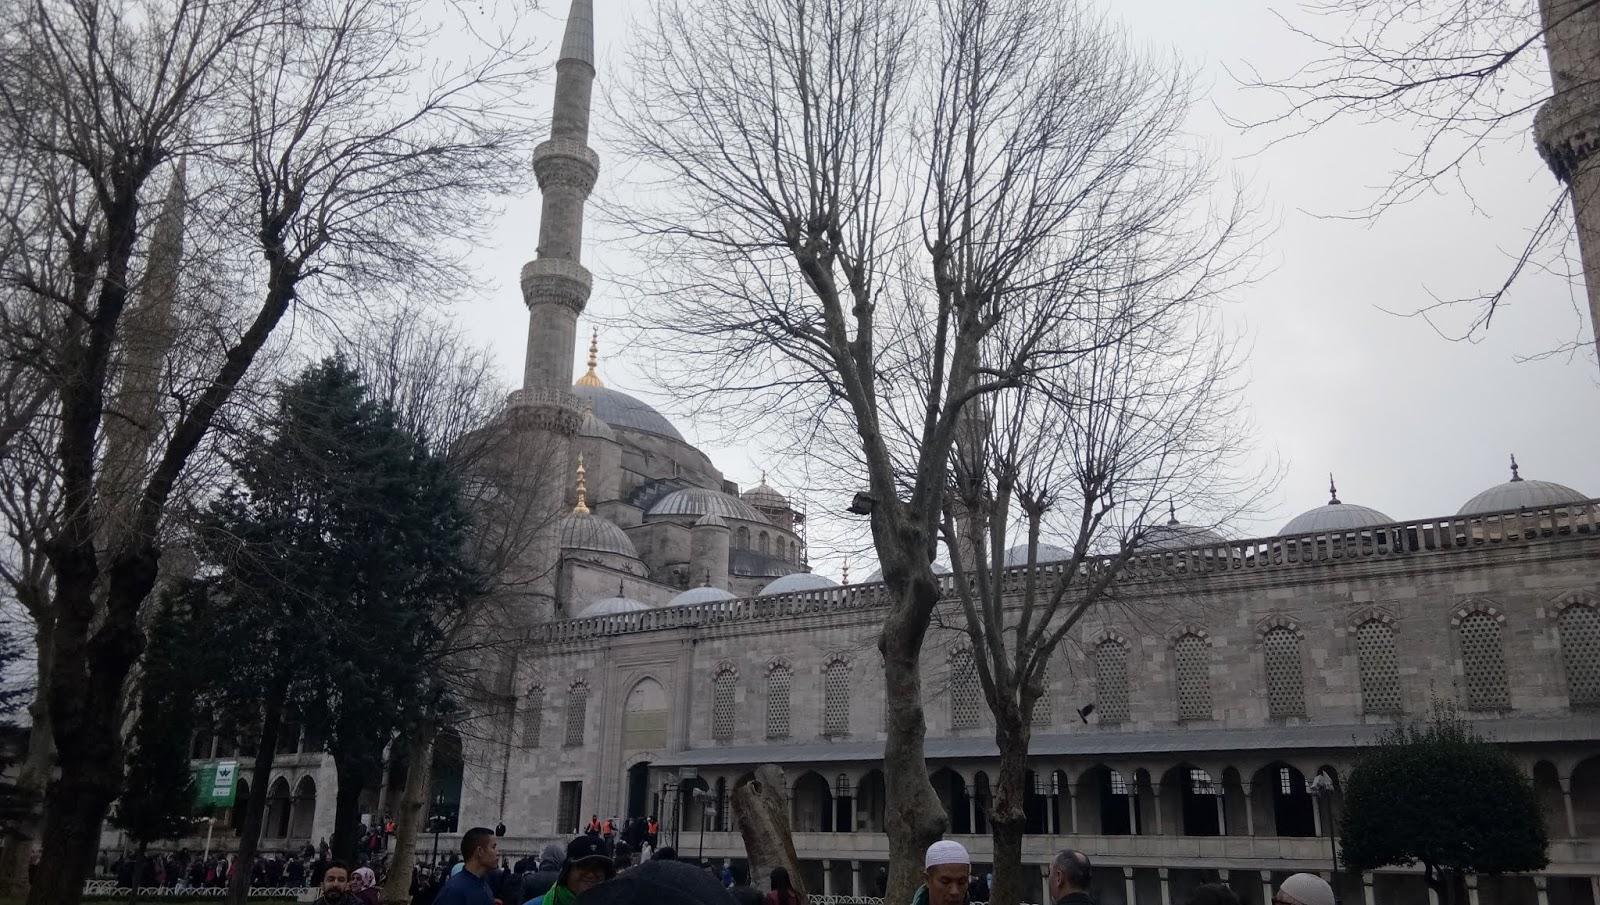 Pengalaman Di Turki Kunjungan Ke Masjid Biru Istanbul Iqbalogi Com